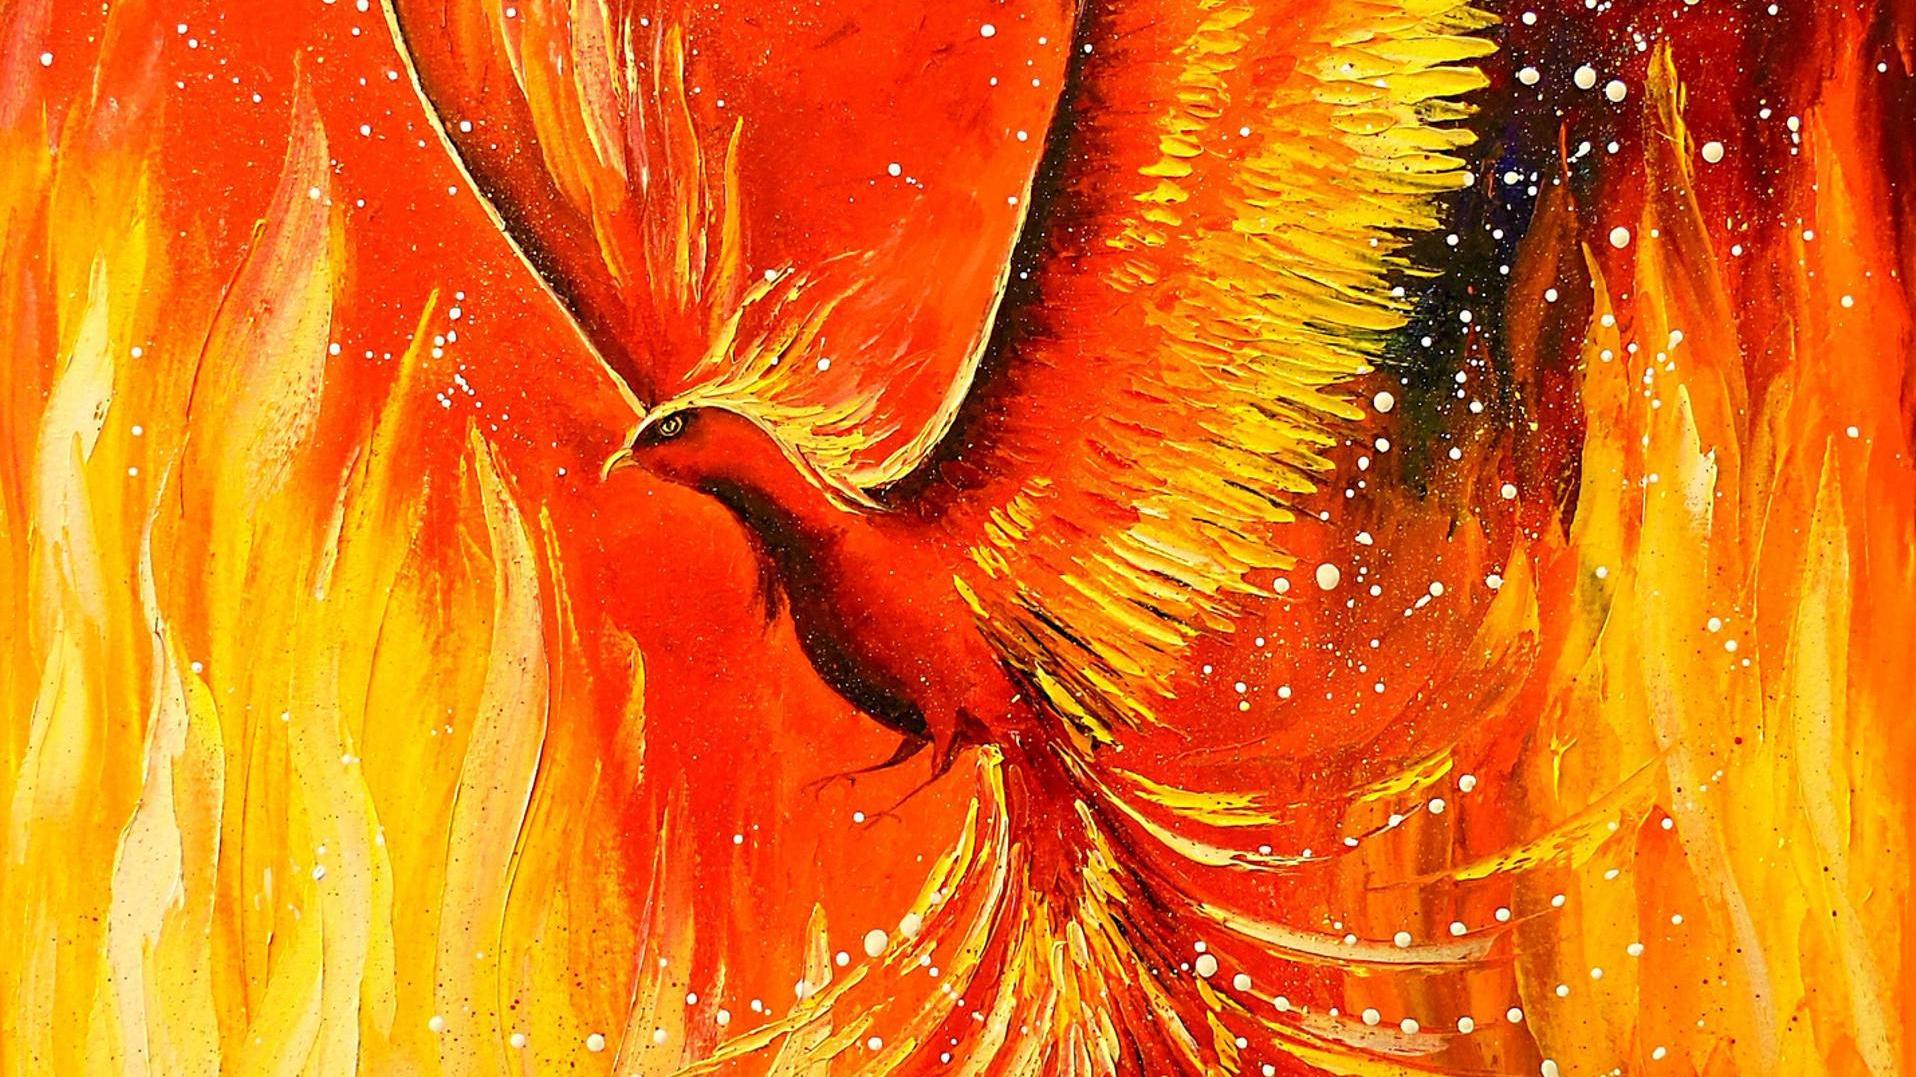 [Gods of Wandrossa] Year 9K4 – Whispers of the Phoenix